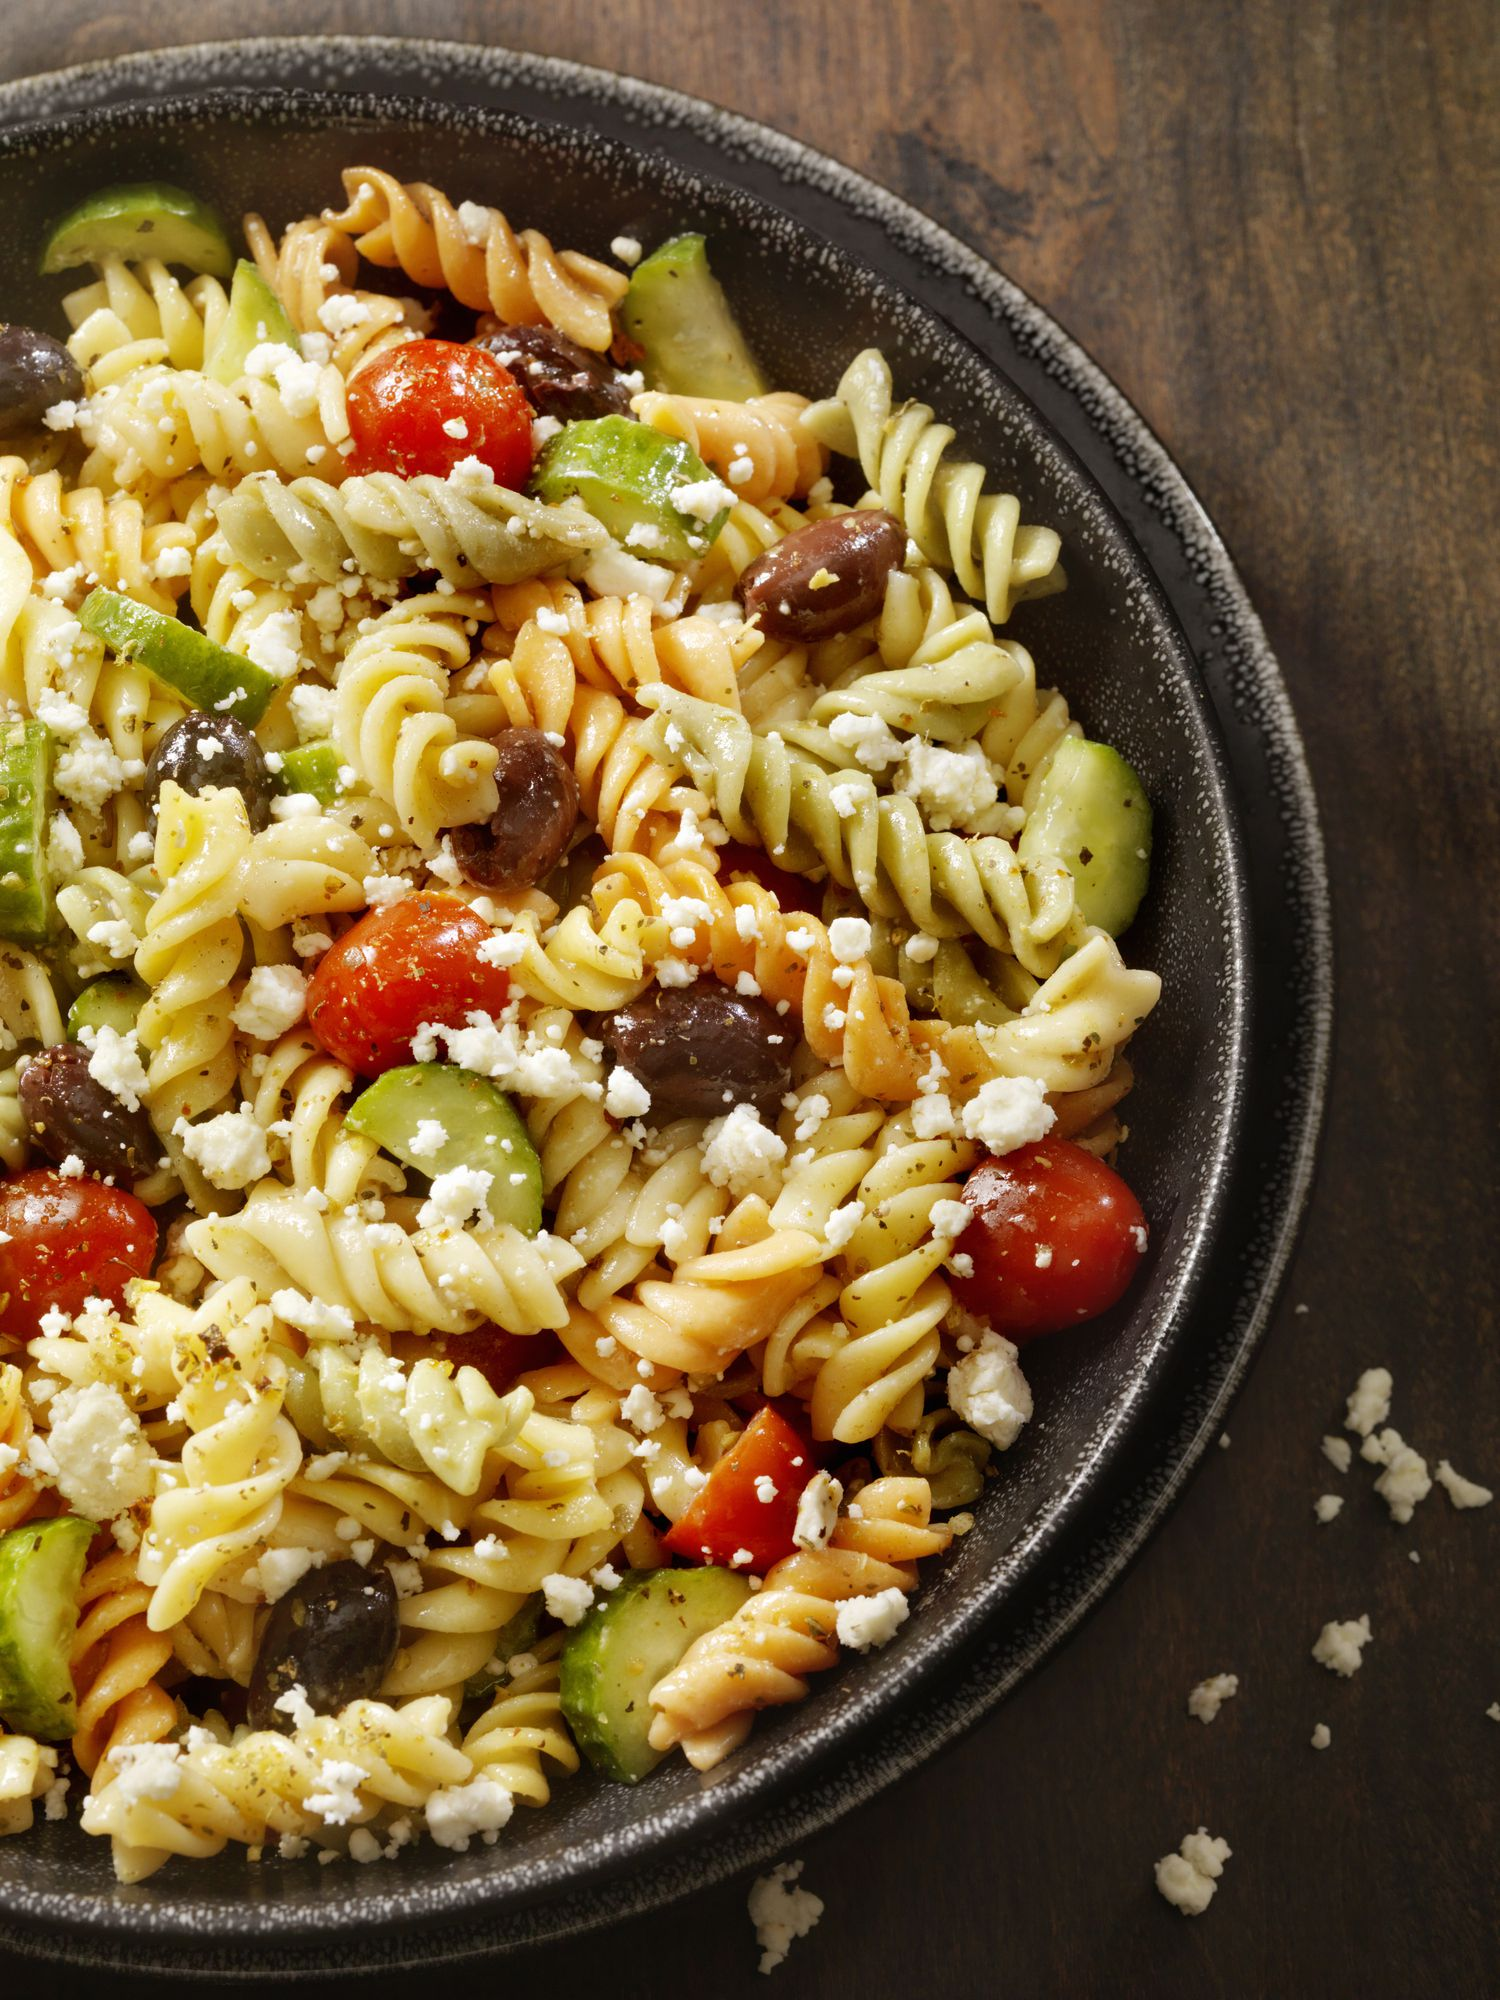 vegetarian olive and feta pasta recipe. Black Bedroom Furniture Sets. Home Design Ideas